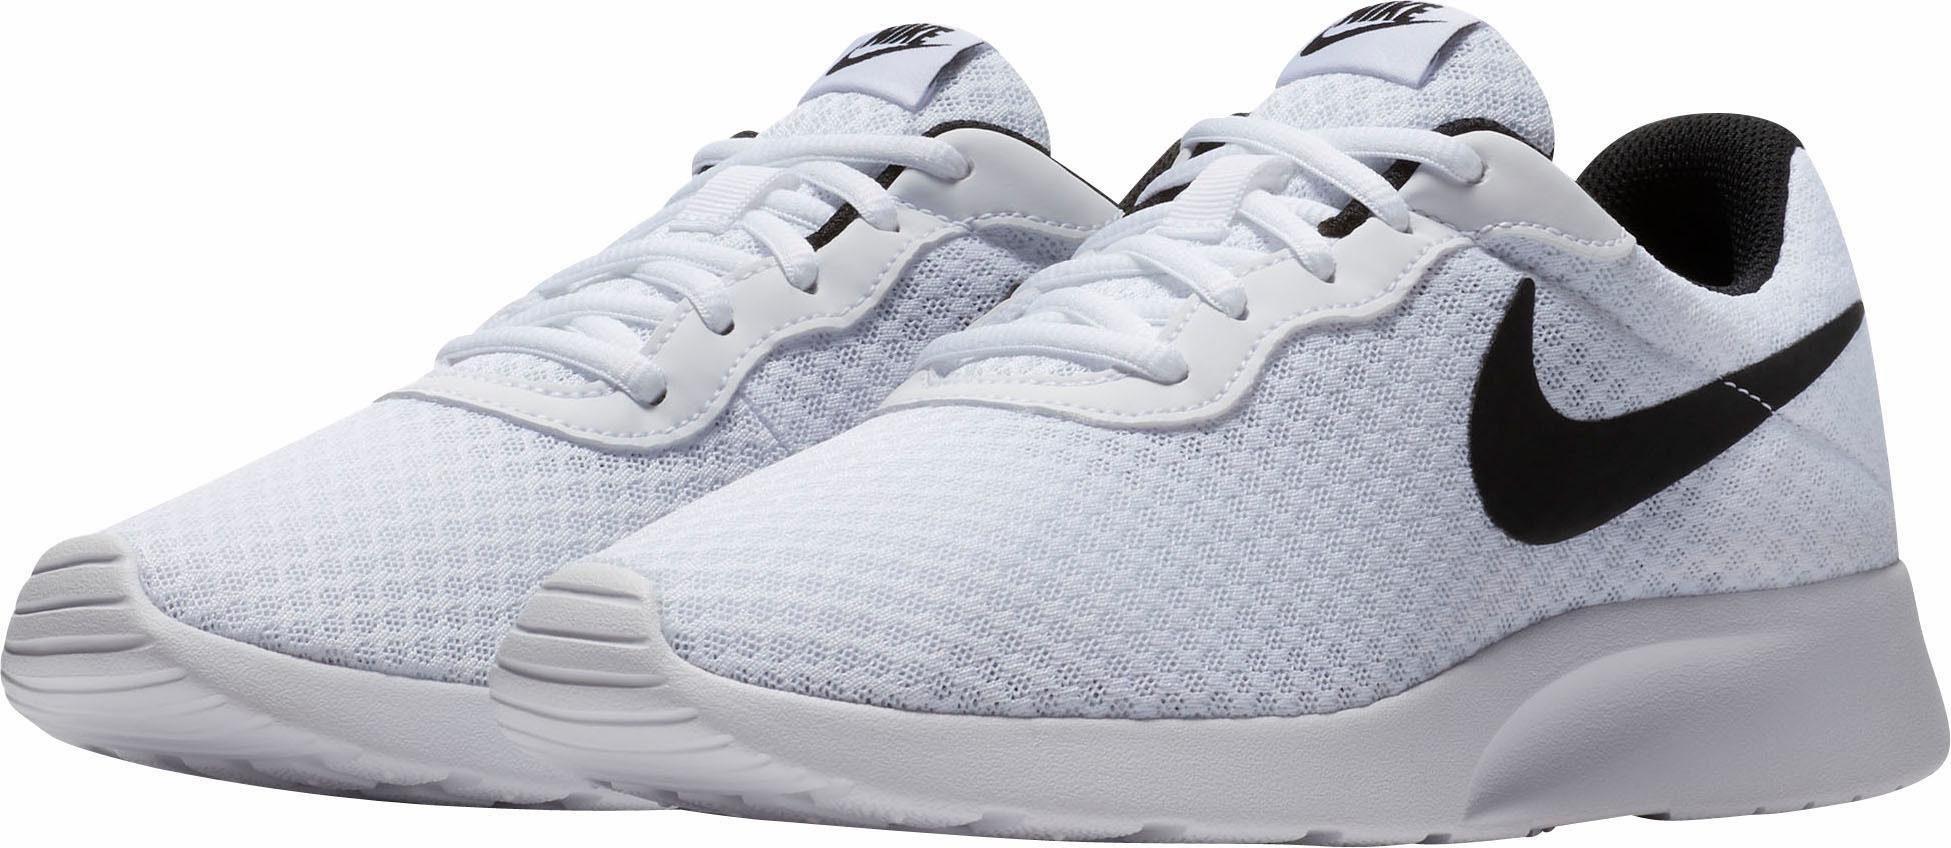 Nike Sportswear »Tanjun Wmns« Sneaker, Modischer Sneaker von Nike online kaufen | OTTO